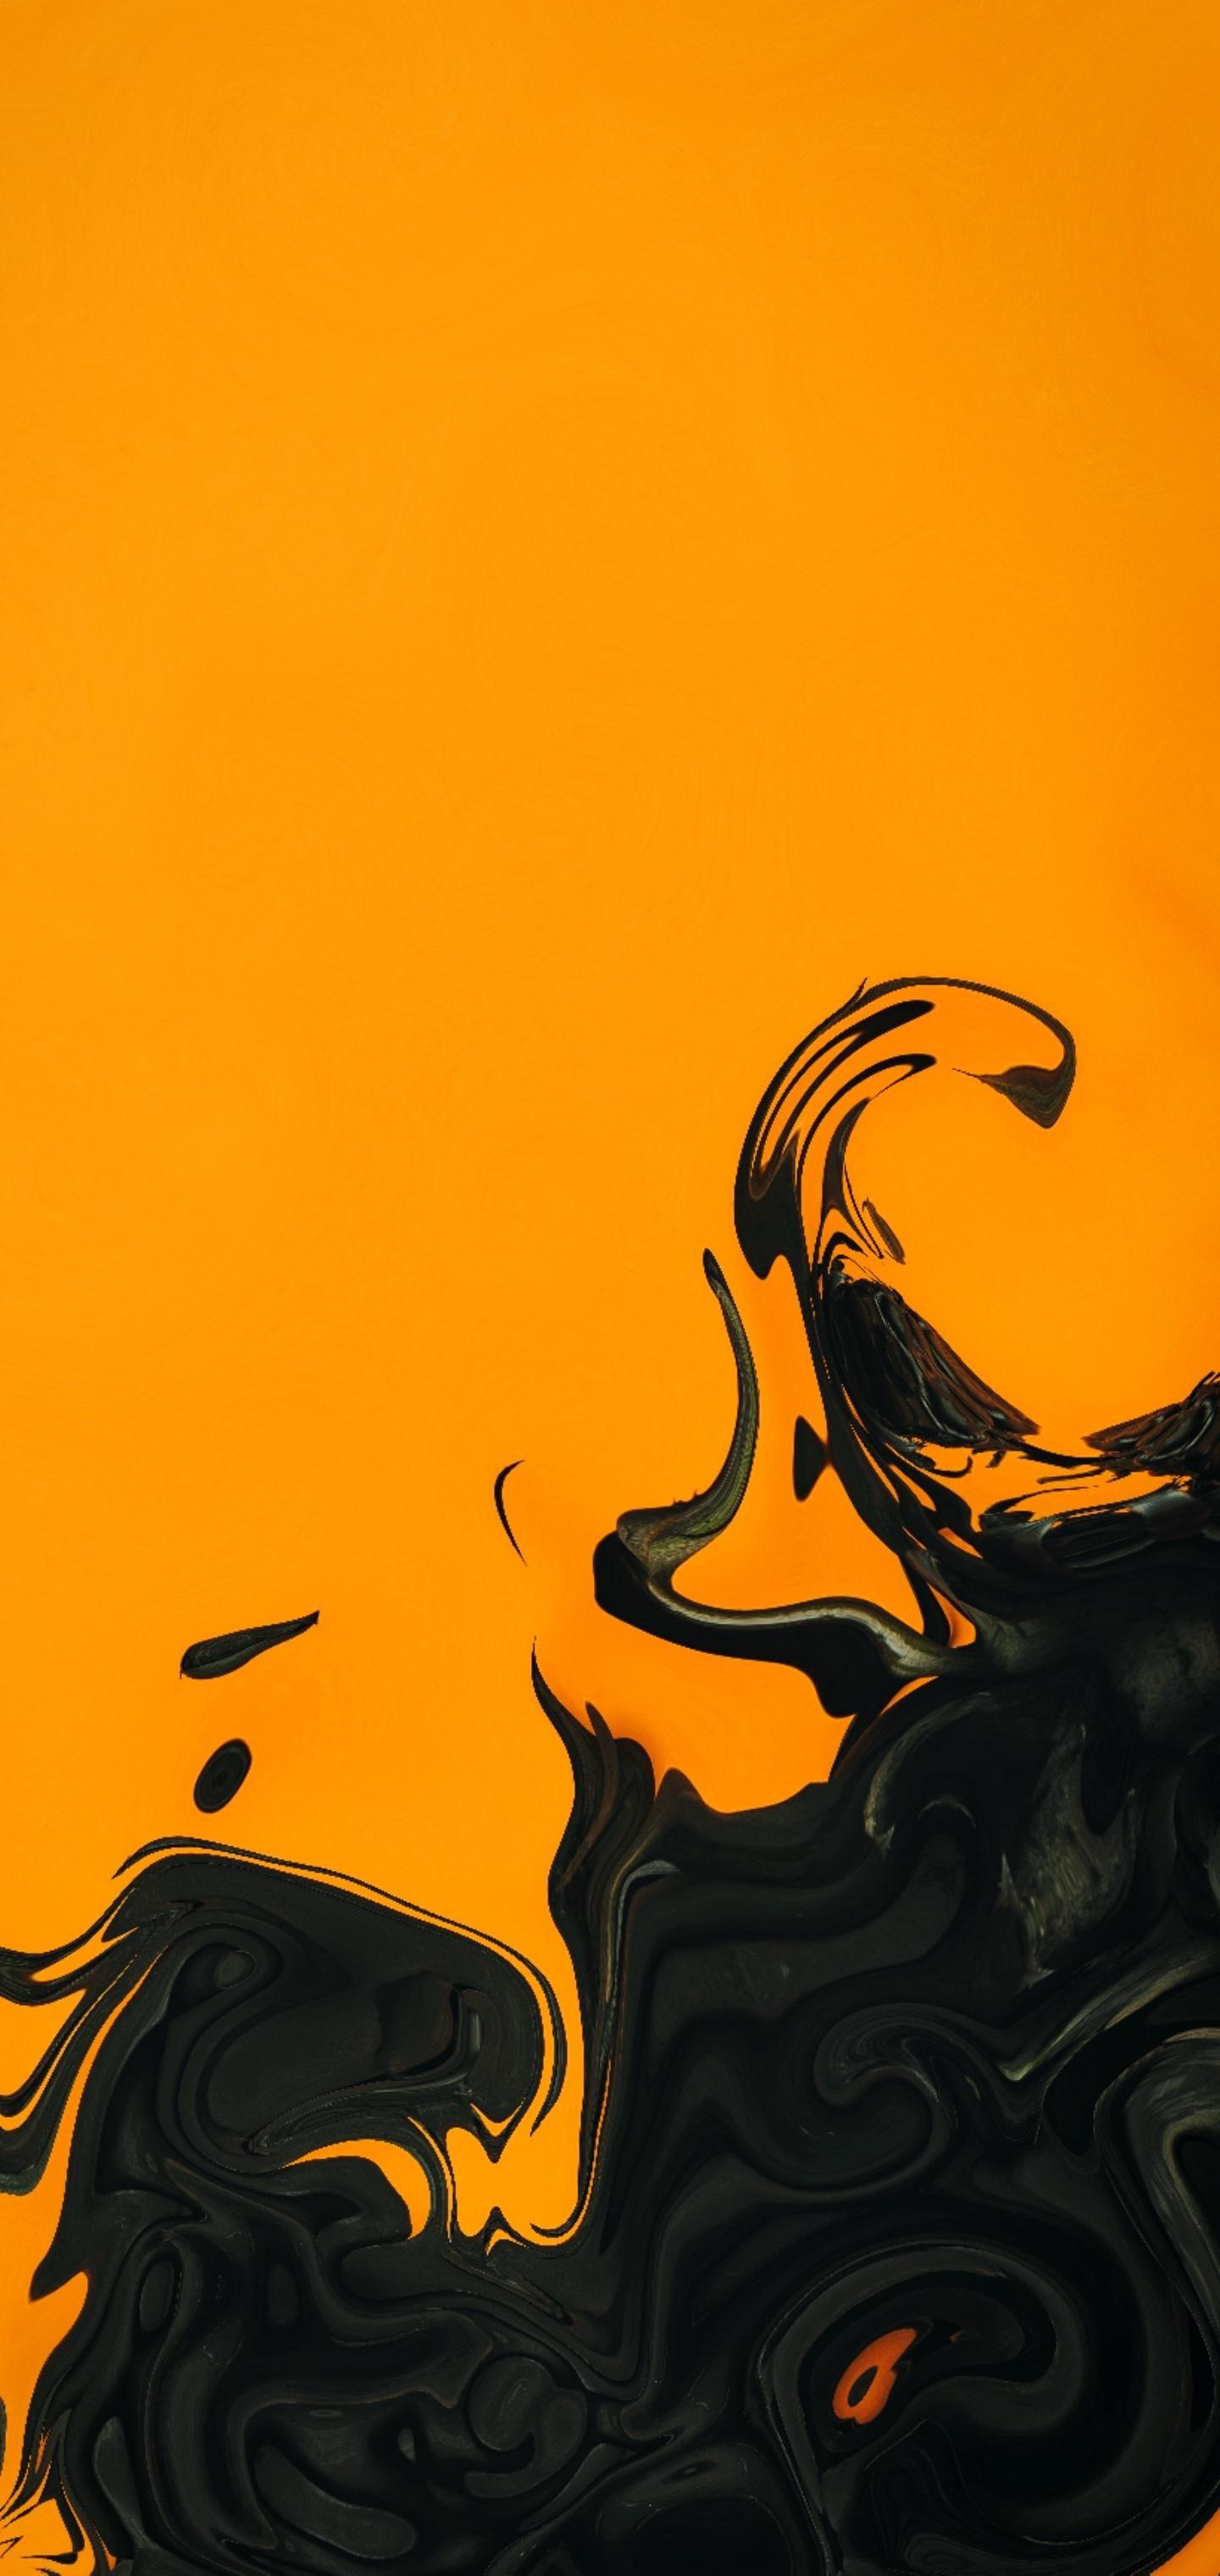 Orange And Black Smart Phone Wallpapers 4kphonewallpapersreddit Iphonewallpapersred Abstract Iphone Wallpaper Abstract Wallpaper Phone Wallpapers Vintage